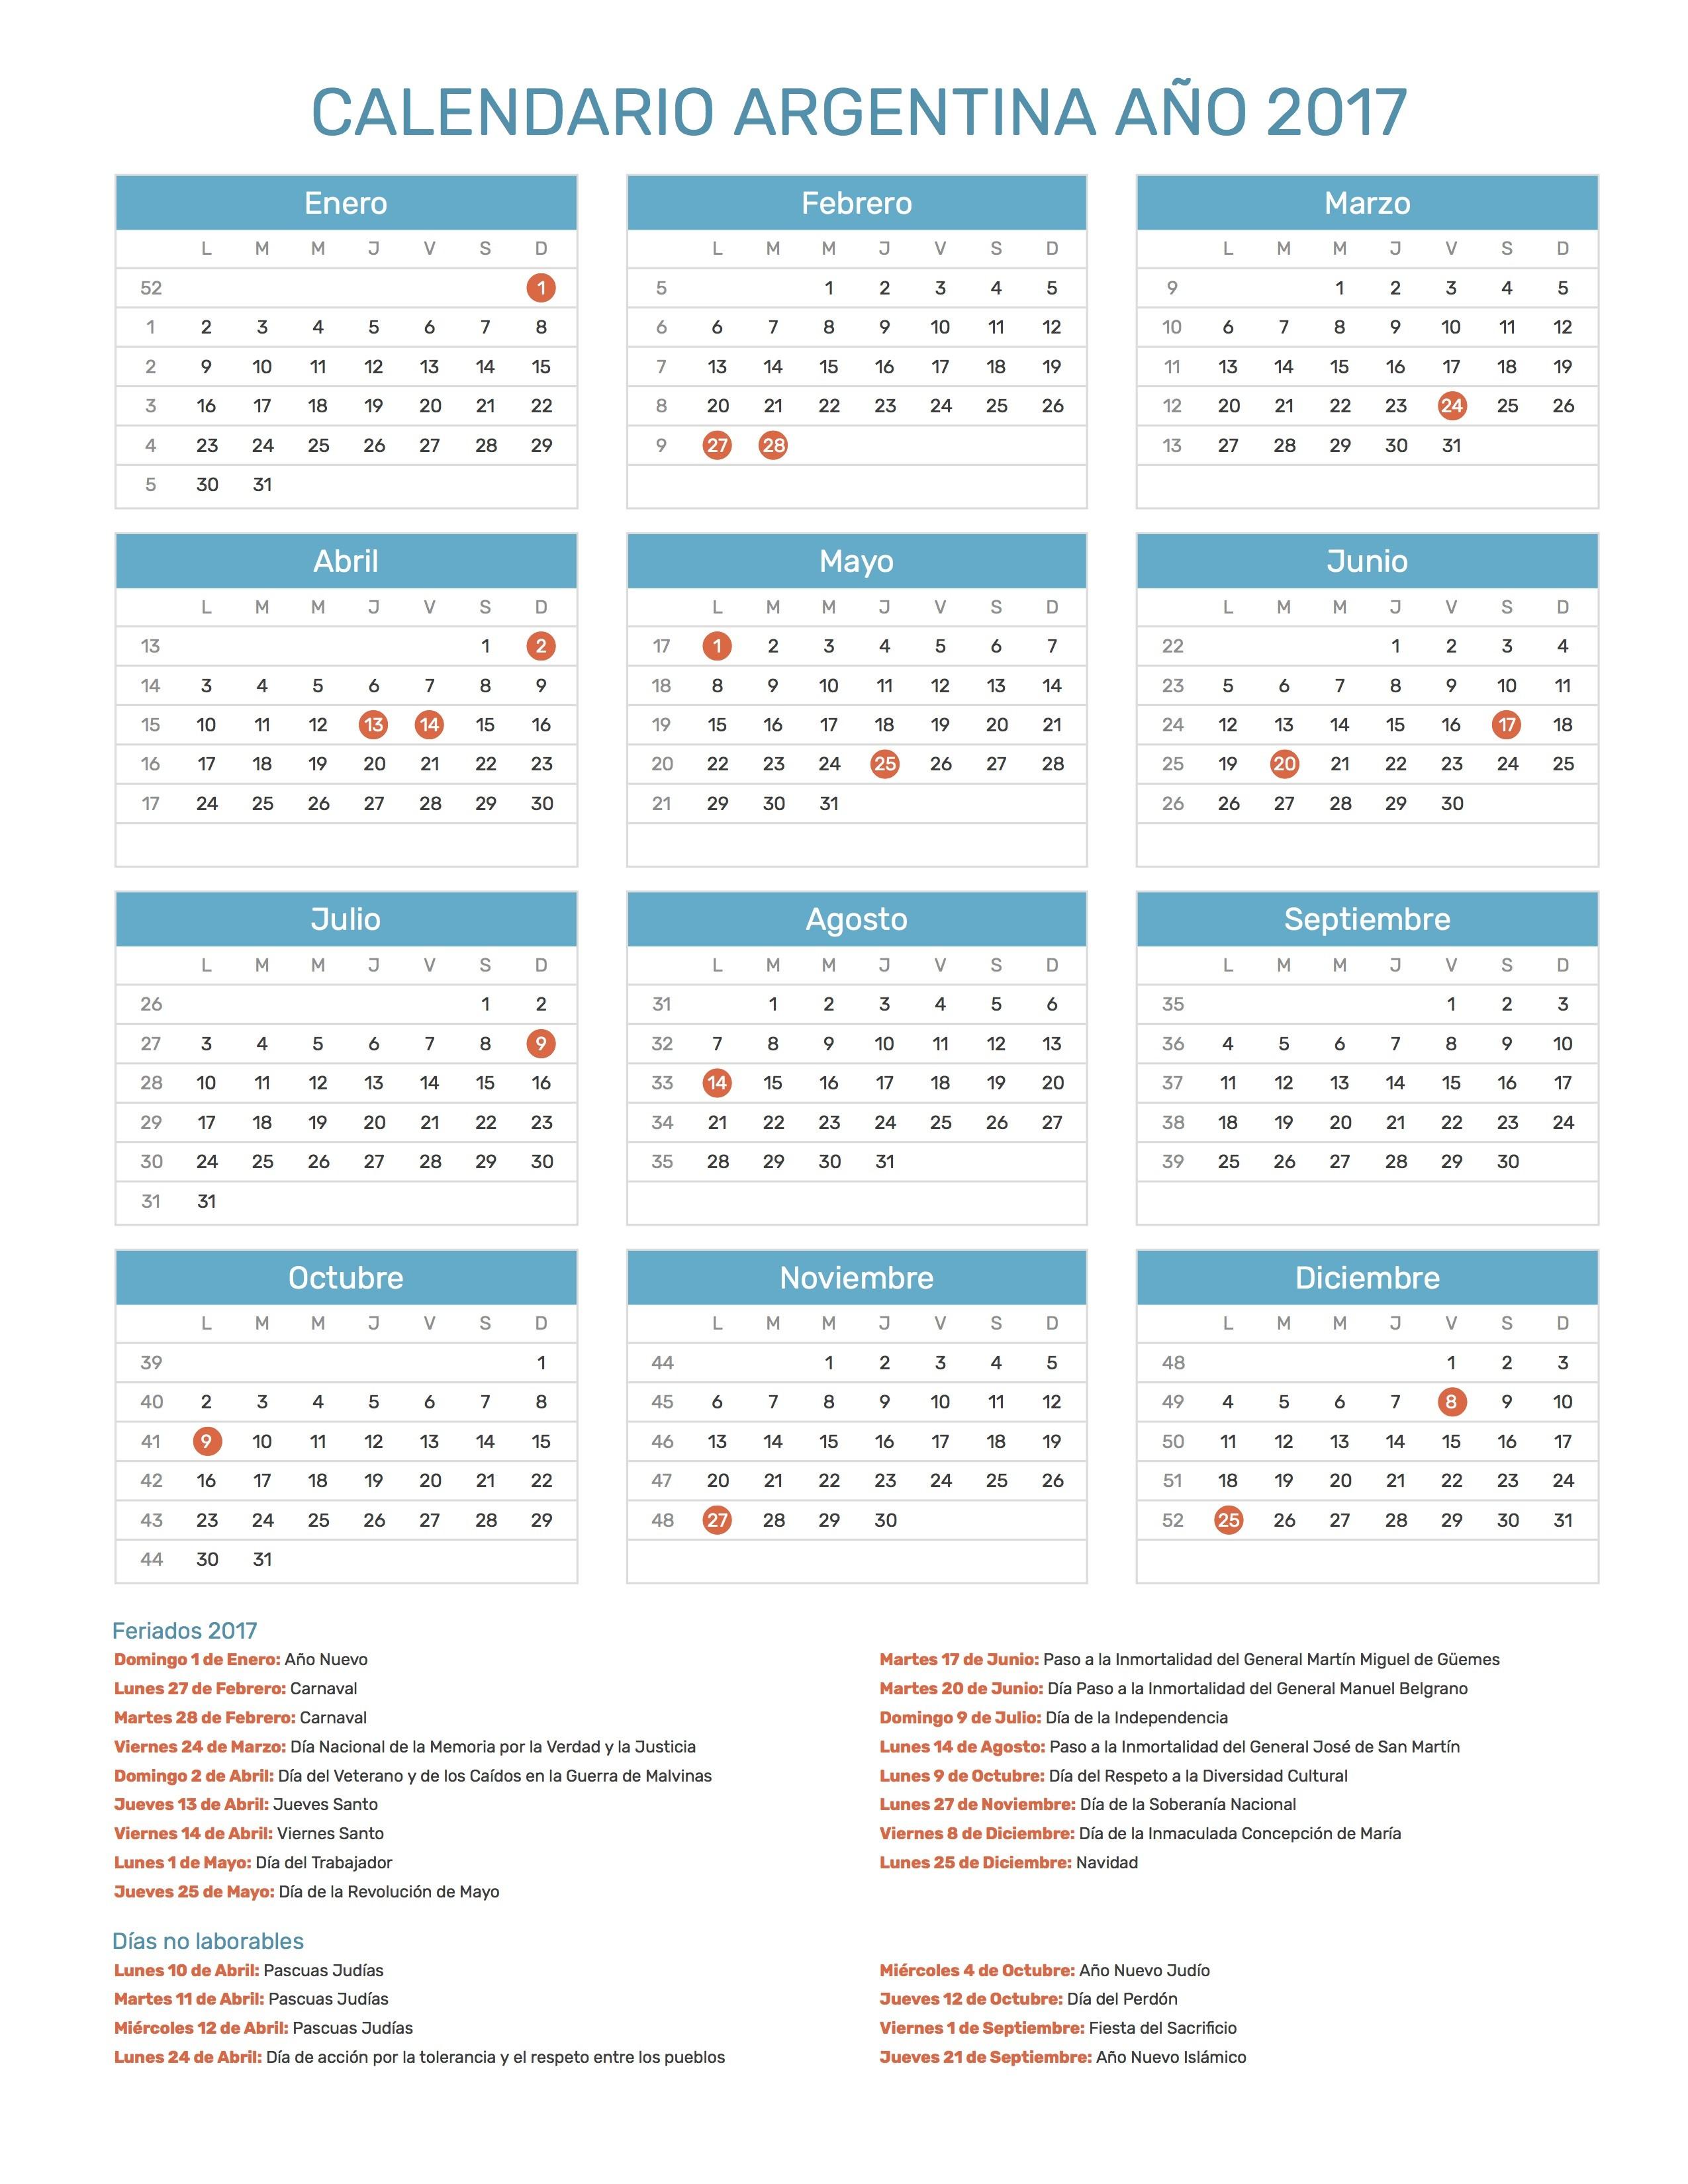 Calendario 2019 Para Imprimir Argentina Feriados Recientes 9 De Julio Argentina Feriado Of Calendario 2019 Para Imprimir Argentina Feriados Actual Calendarios Por Meses Affordable Imgenes De Calendarios Con Color